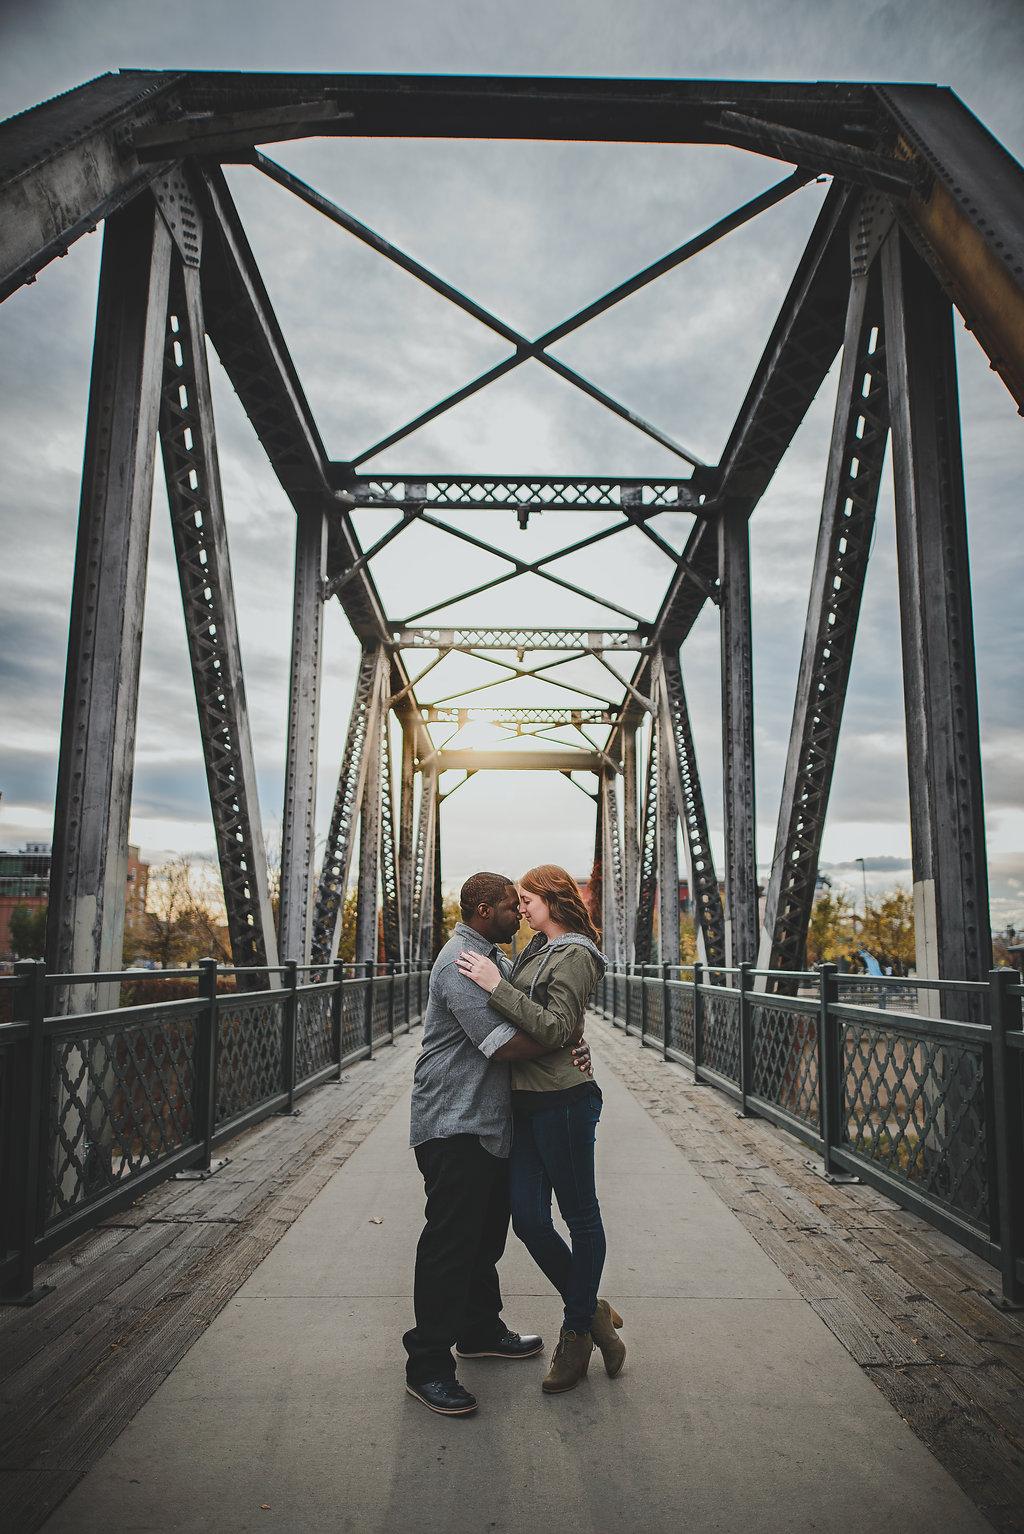 Downtown Denver Colorado Union Station Wedding Engagement Session Suzanne Jakes